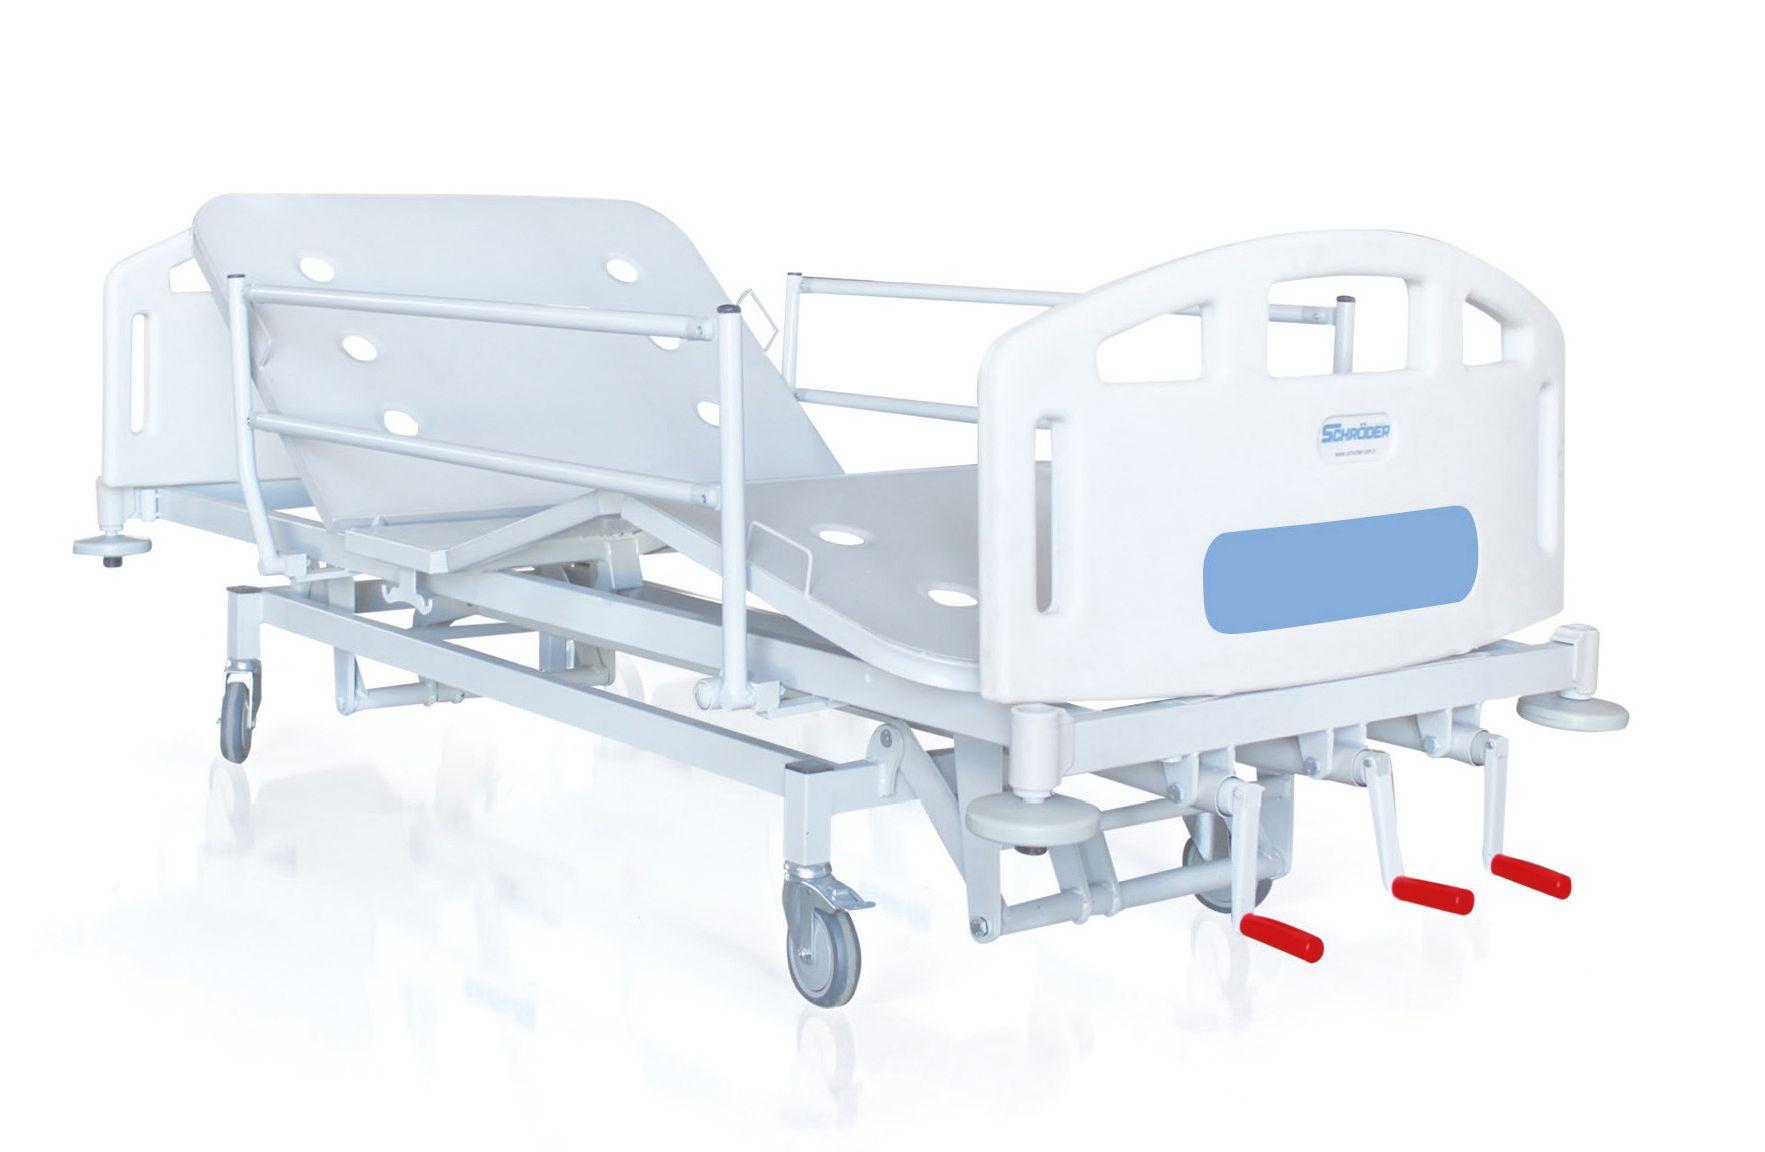 Pin By Hastane Ekipman Tasarimlari On Proma Medikal Hospital Bed Bed Hospital